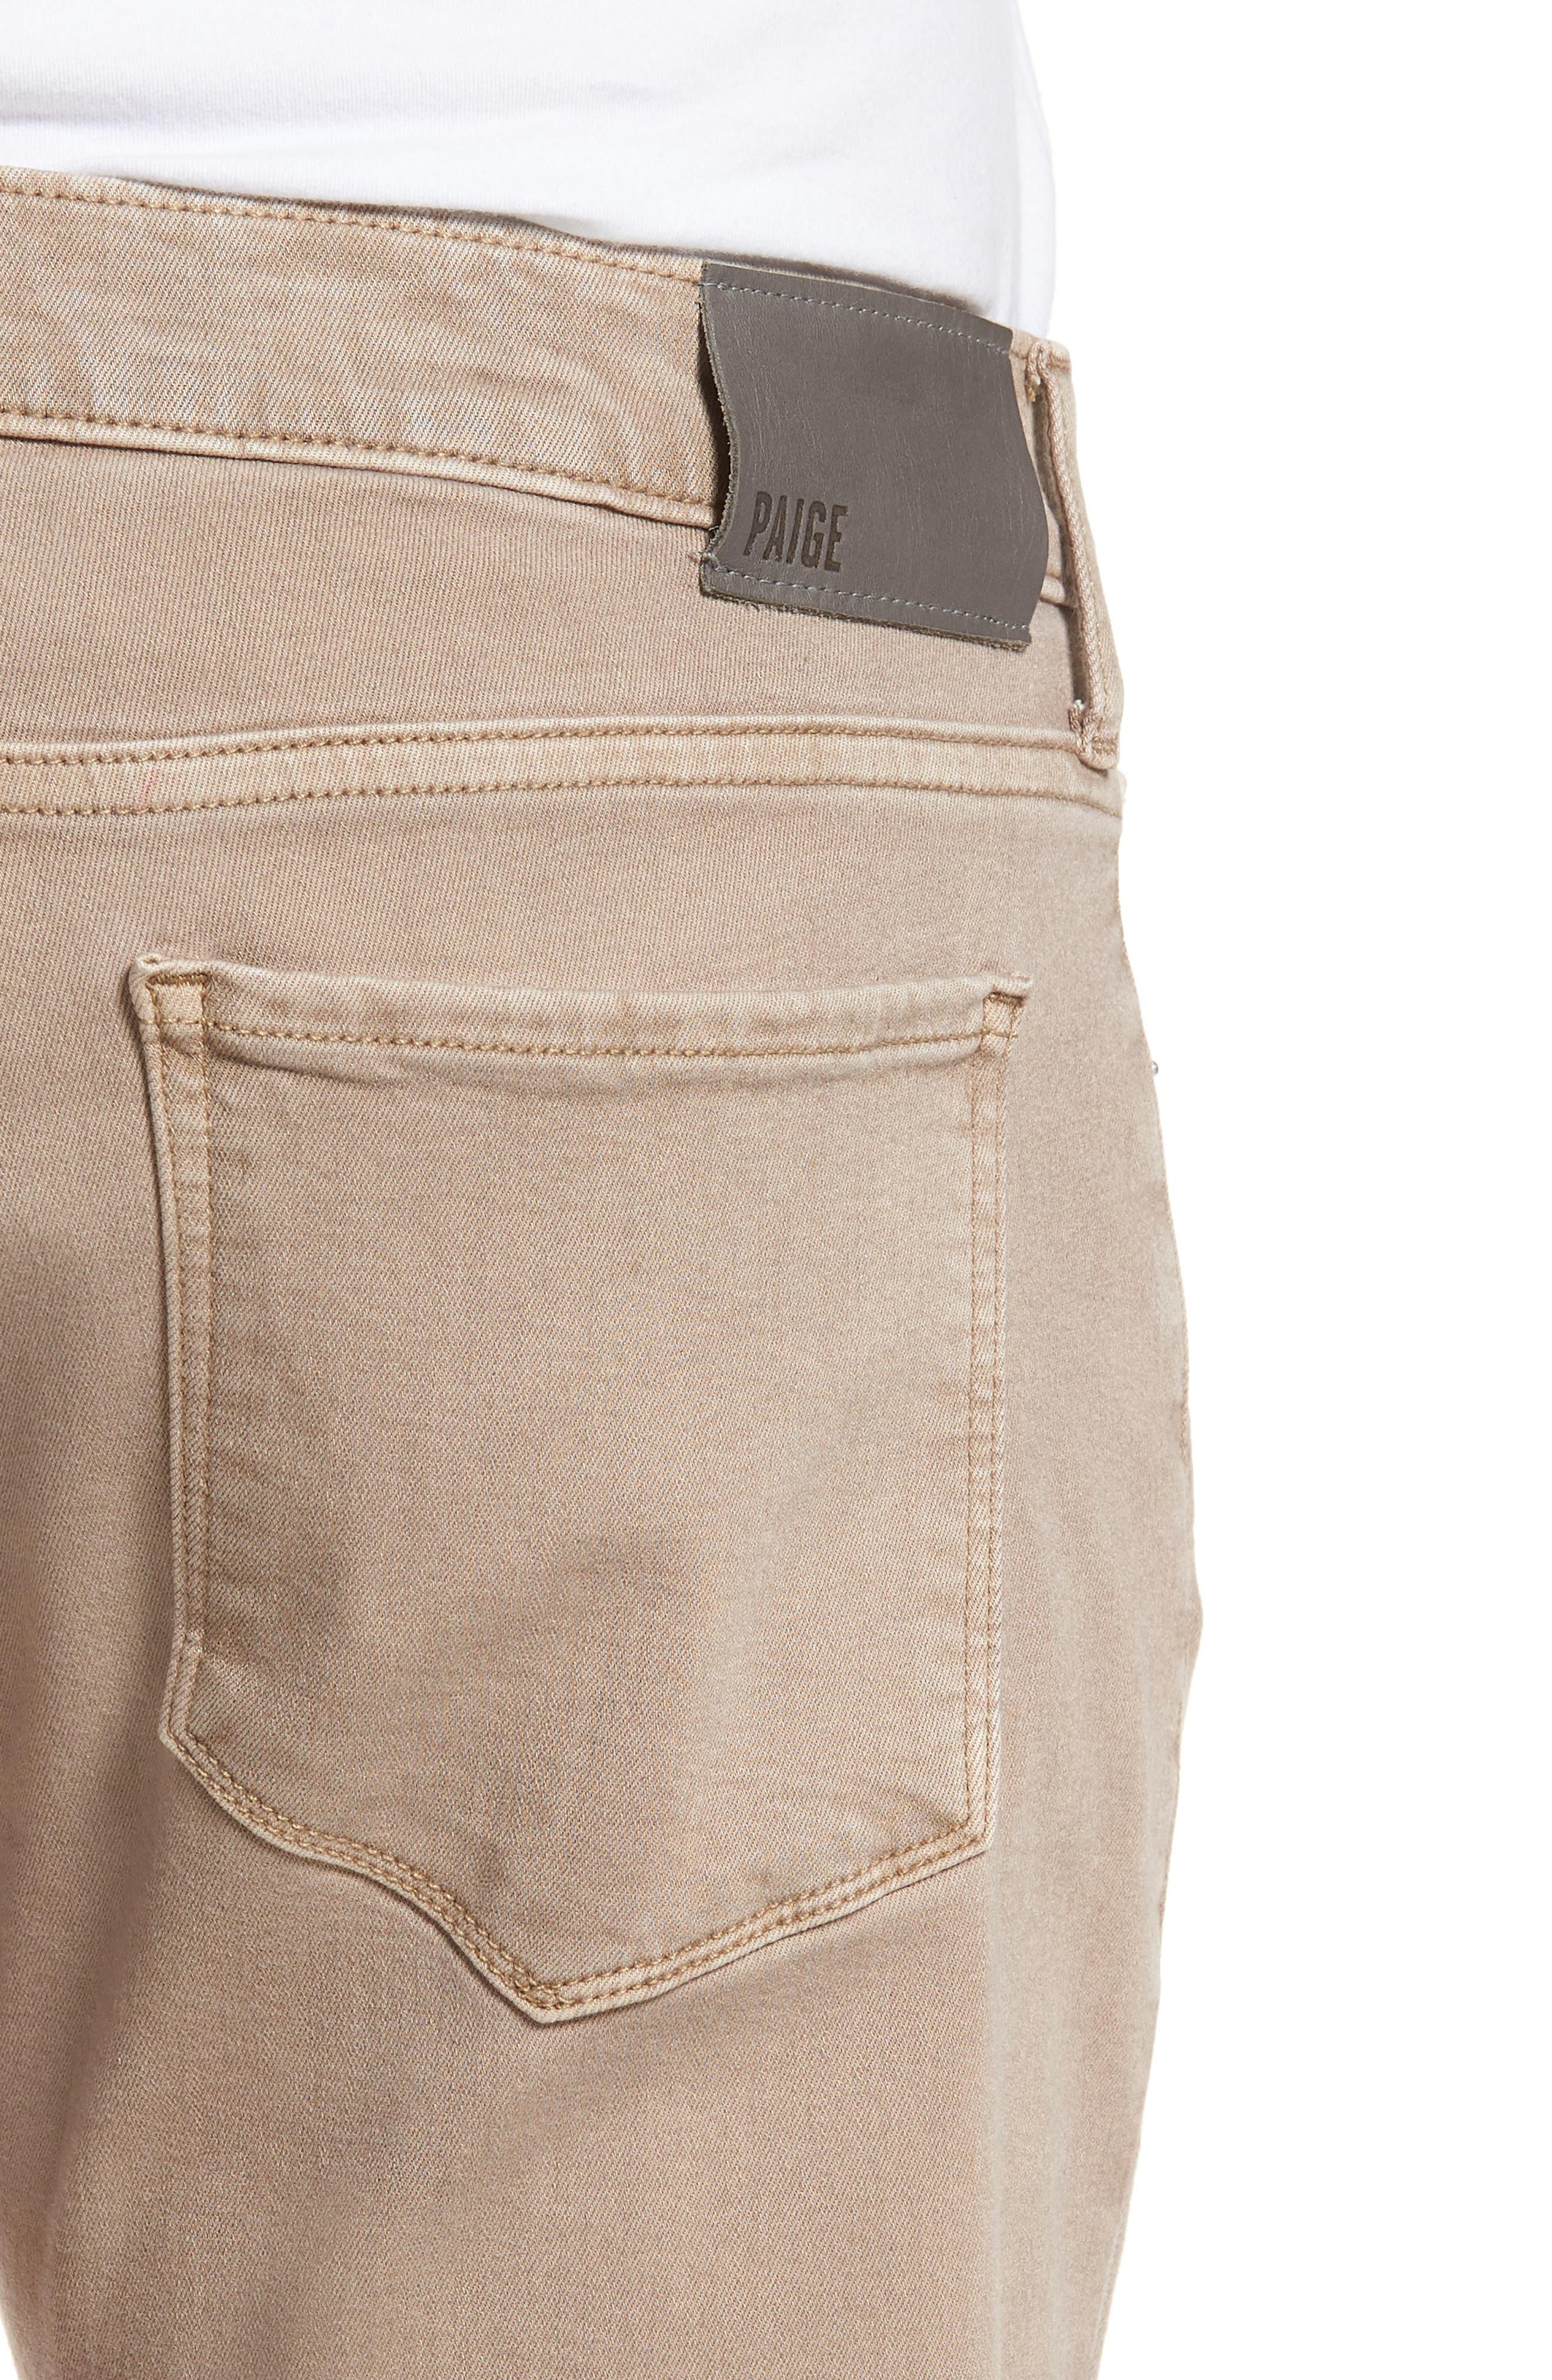 Federal Slim Straight Leg Jeans,                             Alternate thumbnail 4, color,                             Vintage Dune